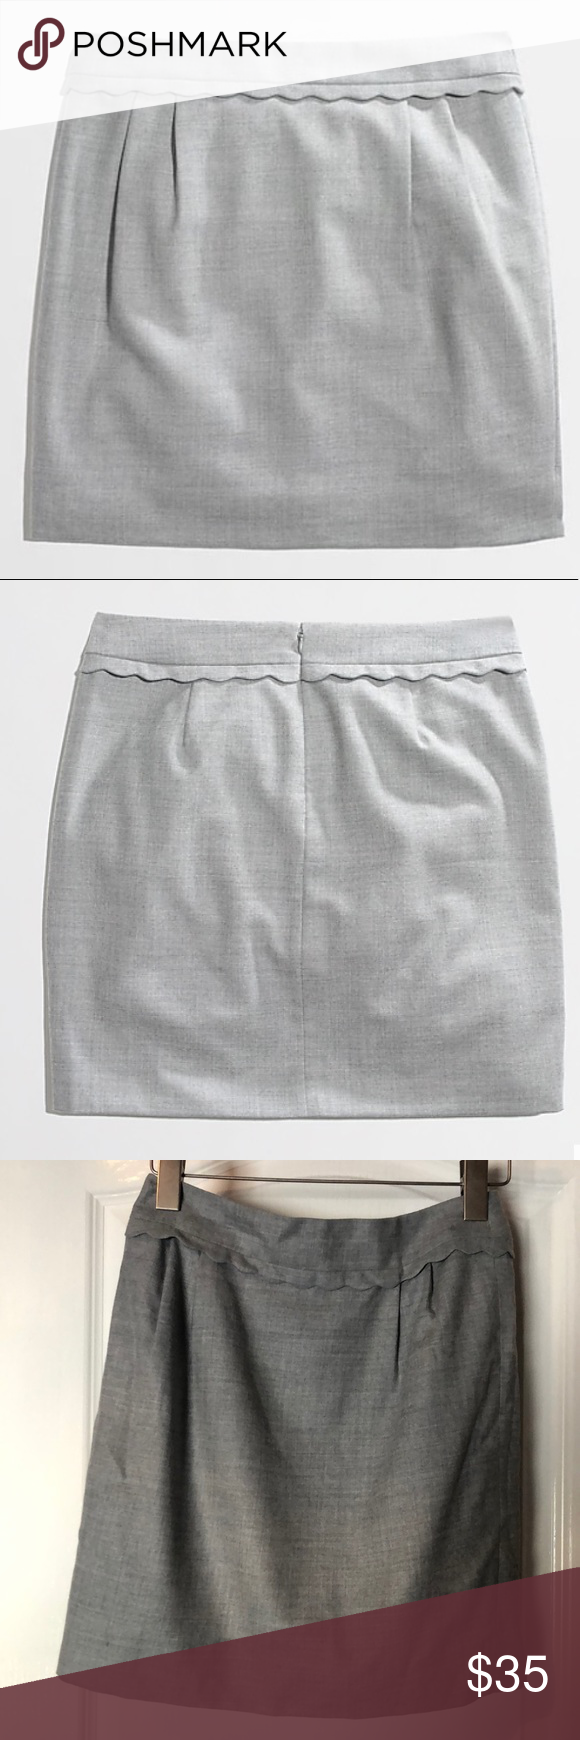 fffdc43478 Light Grey Wool Mini Skirt